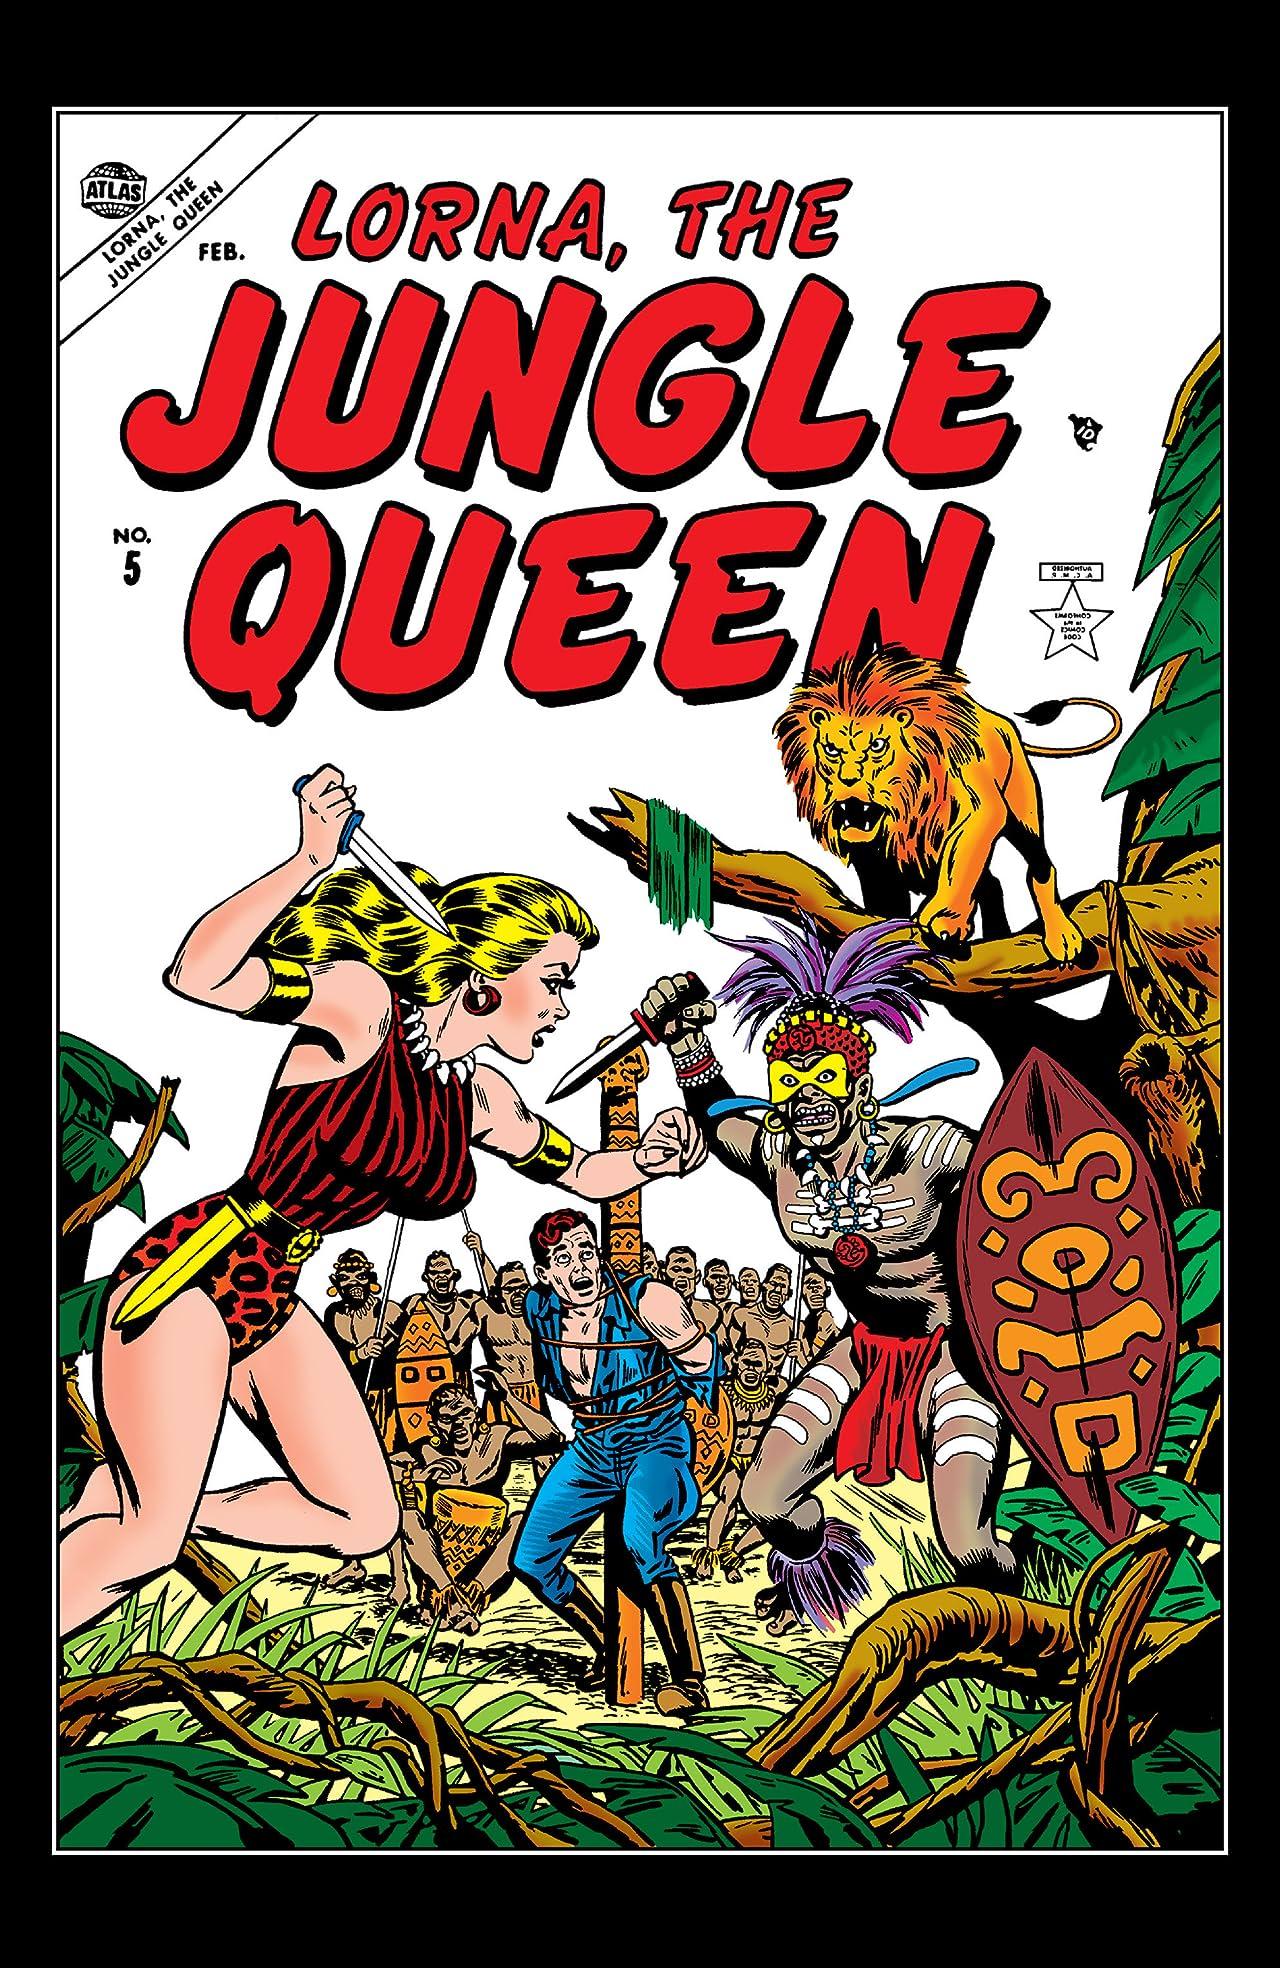 Lorna, The Jungle Queen (1953-1954) #5